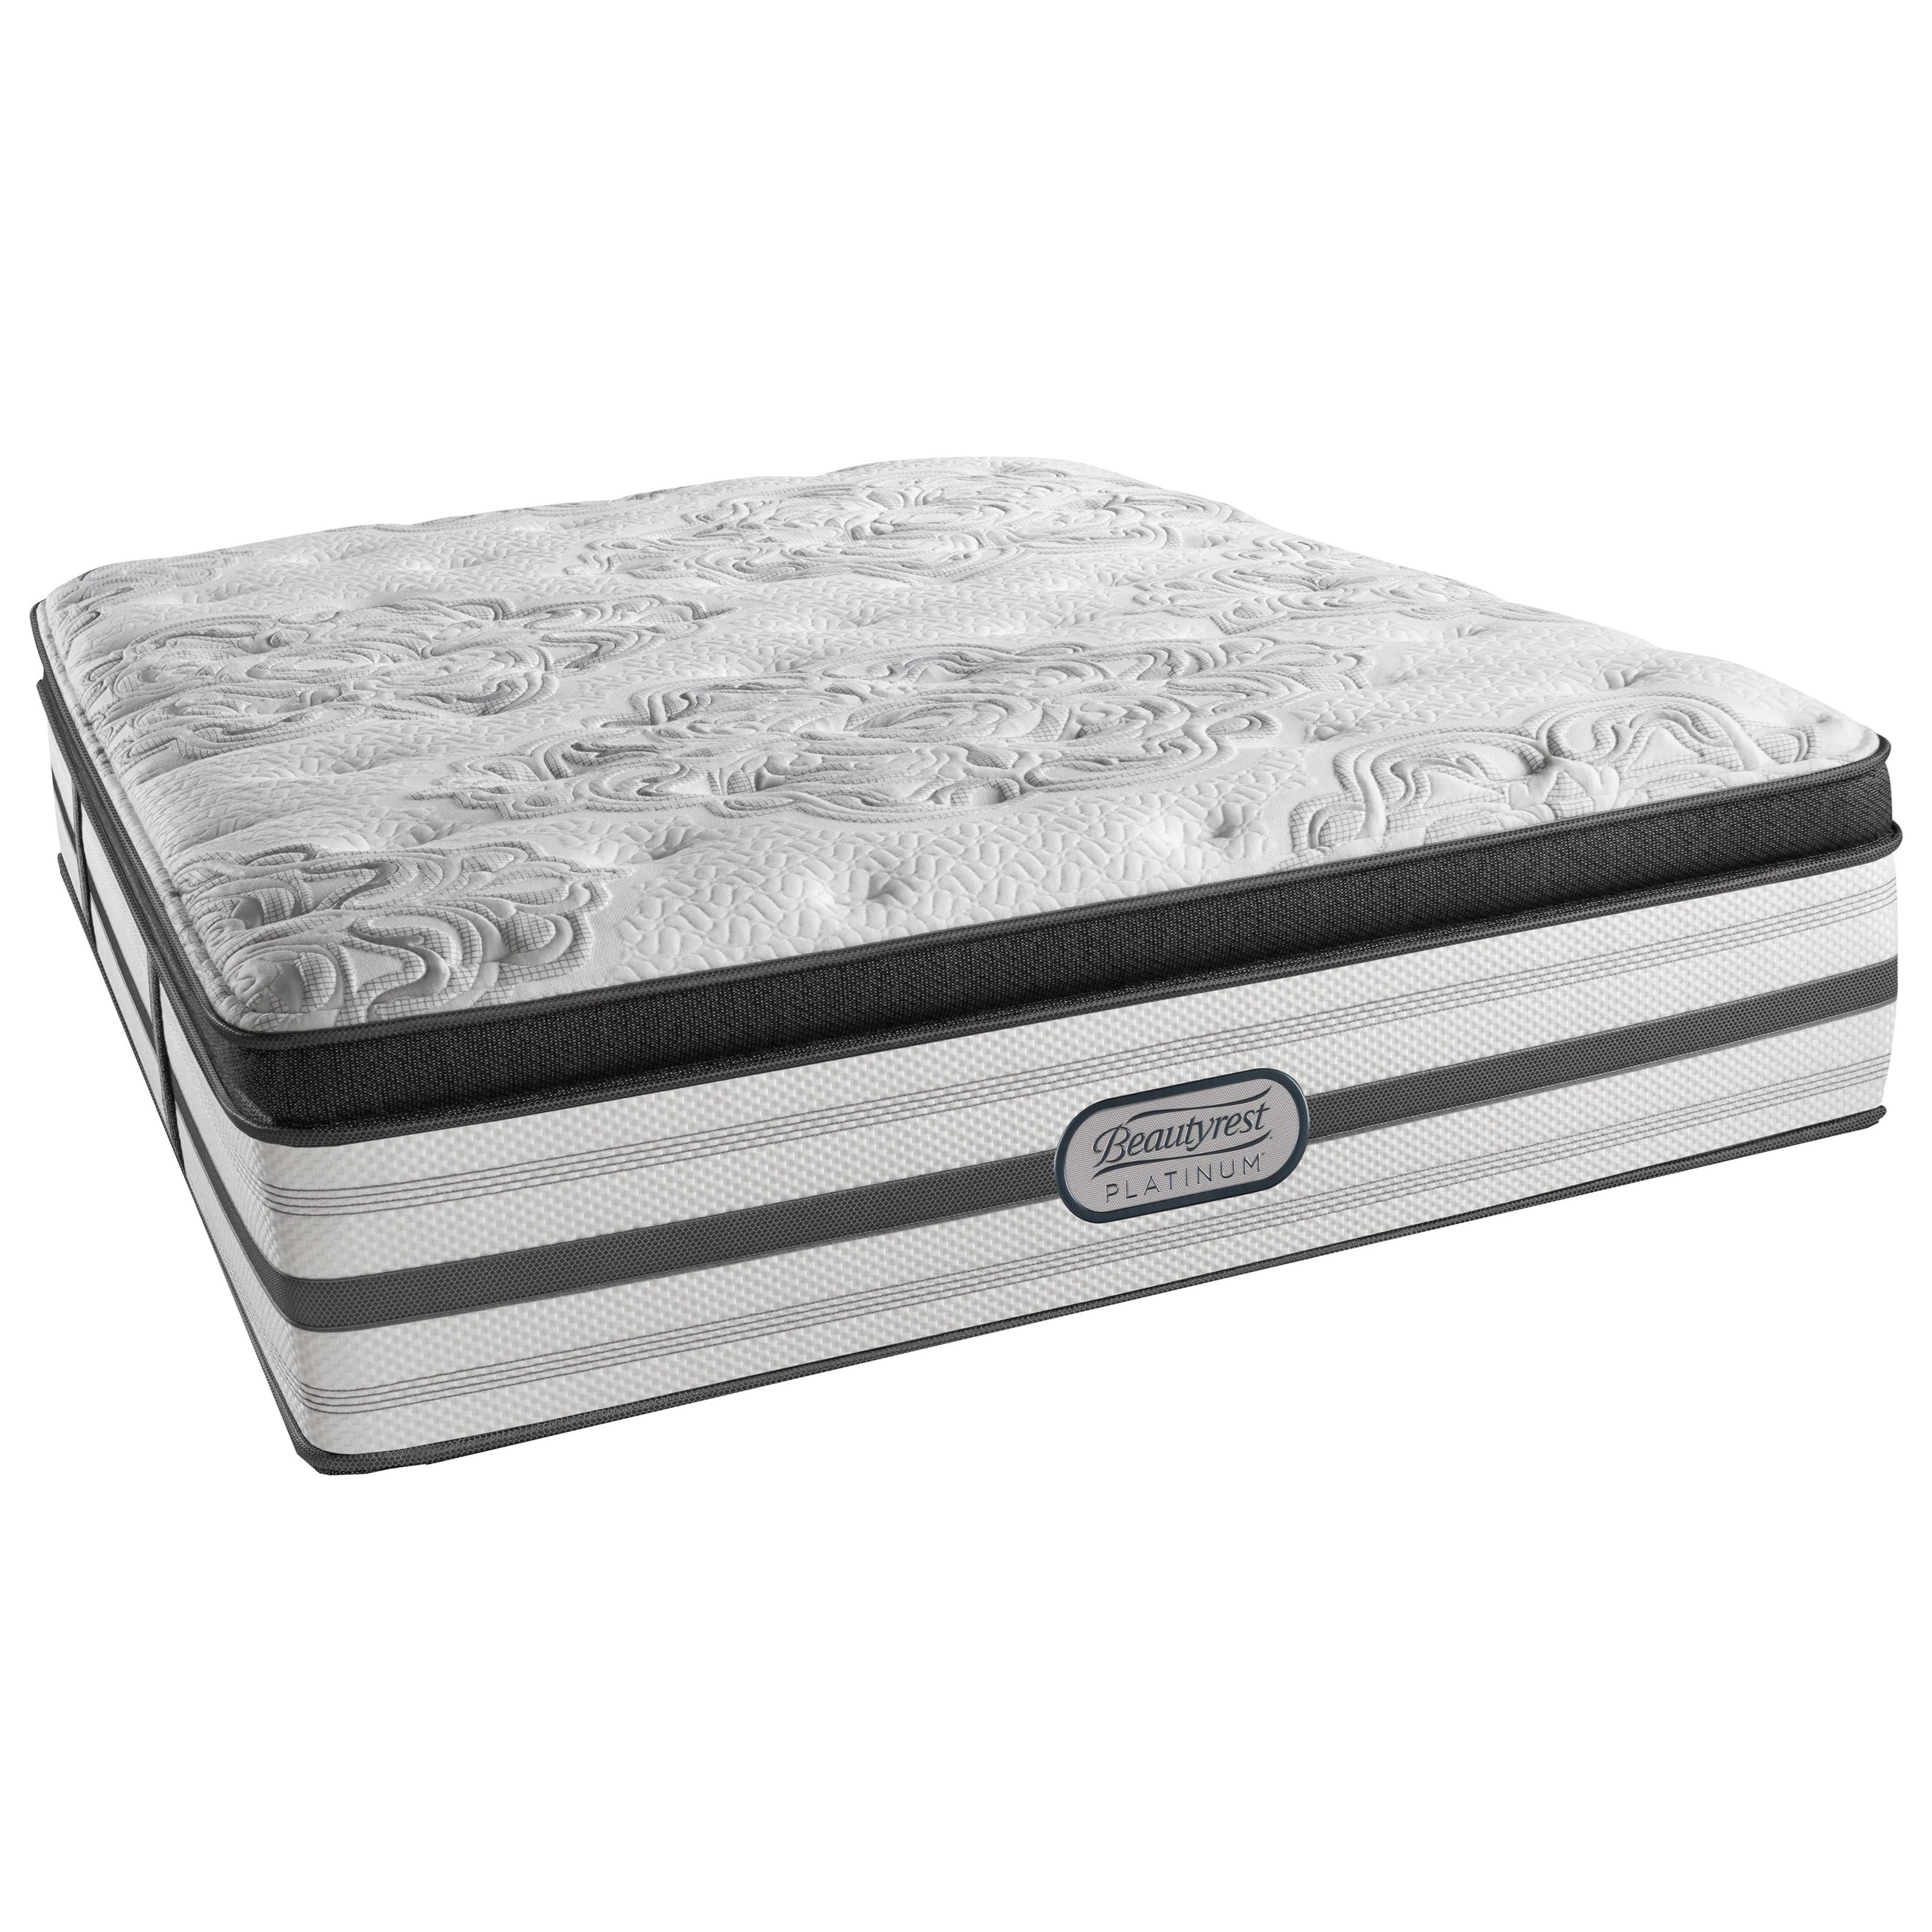 Beautyrest Platinum Katherine Cal King Plush Box Top Adjustable Set - Item Number: LV4PLBT-CK+2xSM3-SPCK